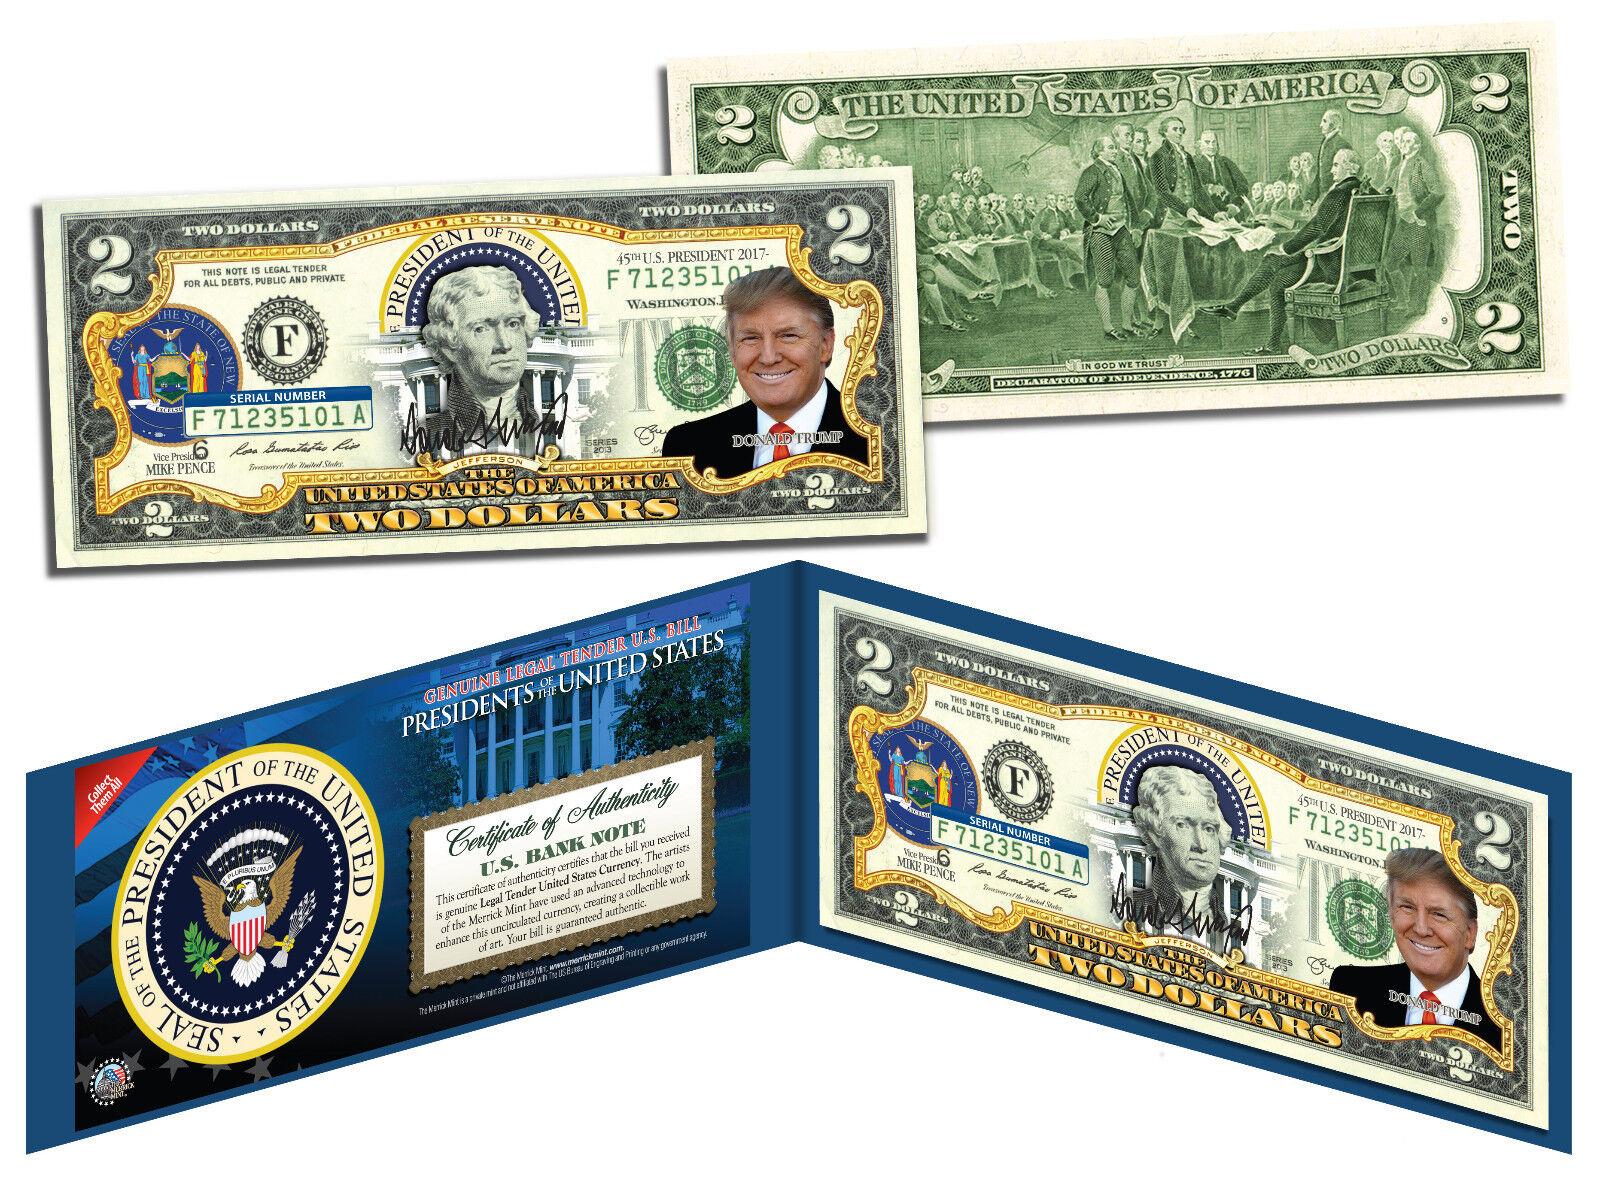 DONALD TRUMP * Presidential Series #45 * Genuine Legal Tender U.S. $2 Bill 1